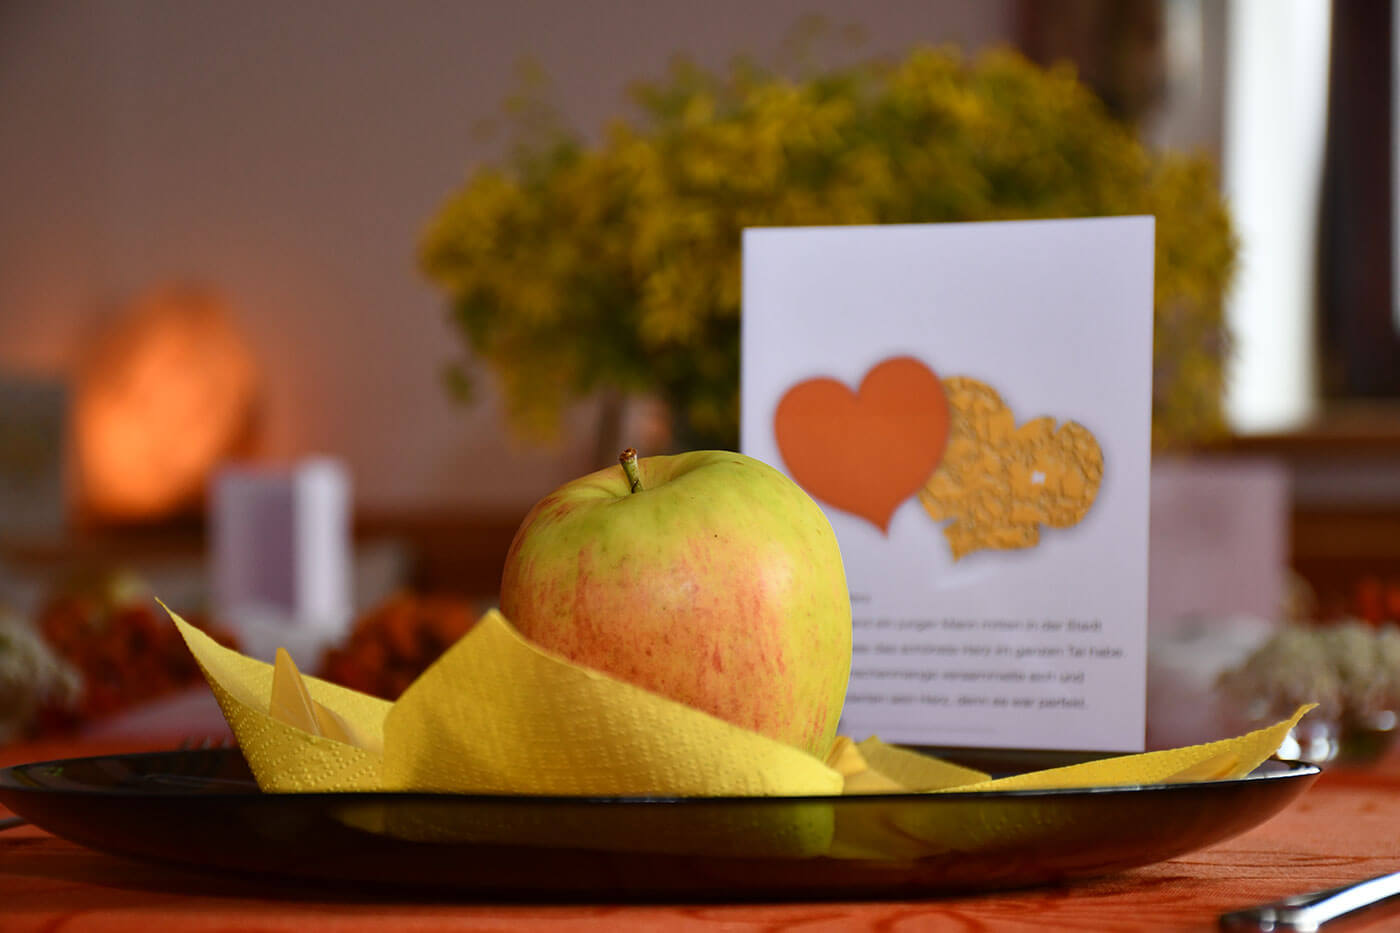 Fastenhaus Dunst: Bewusste Ernährung, besser Essen